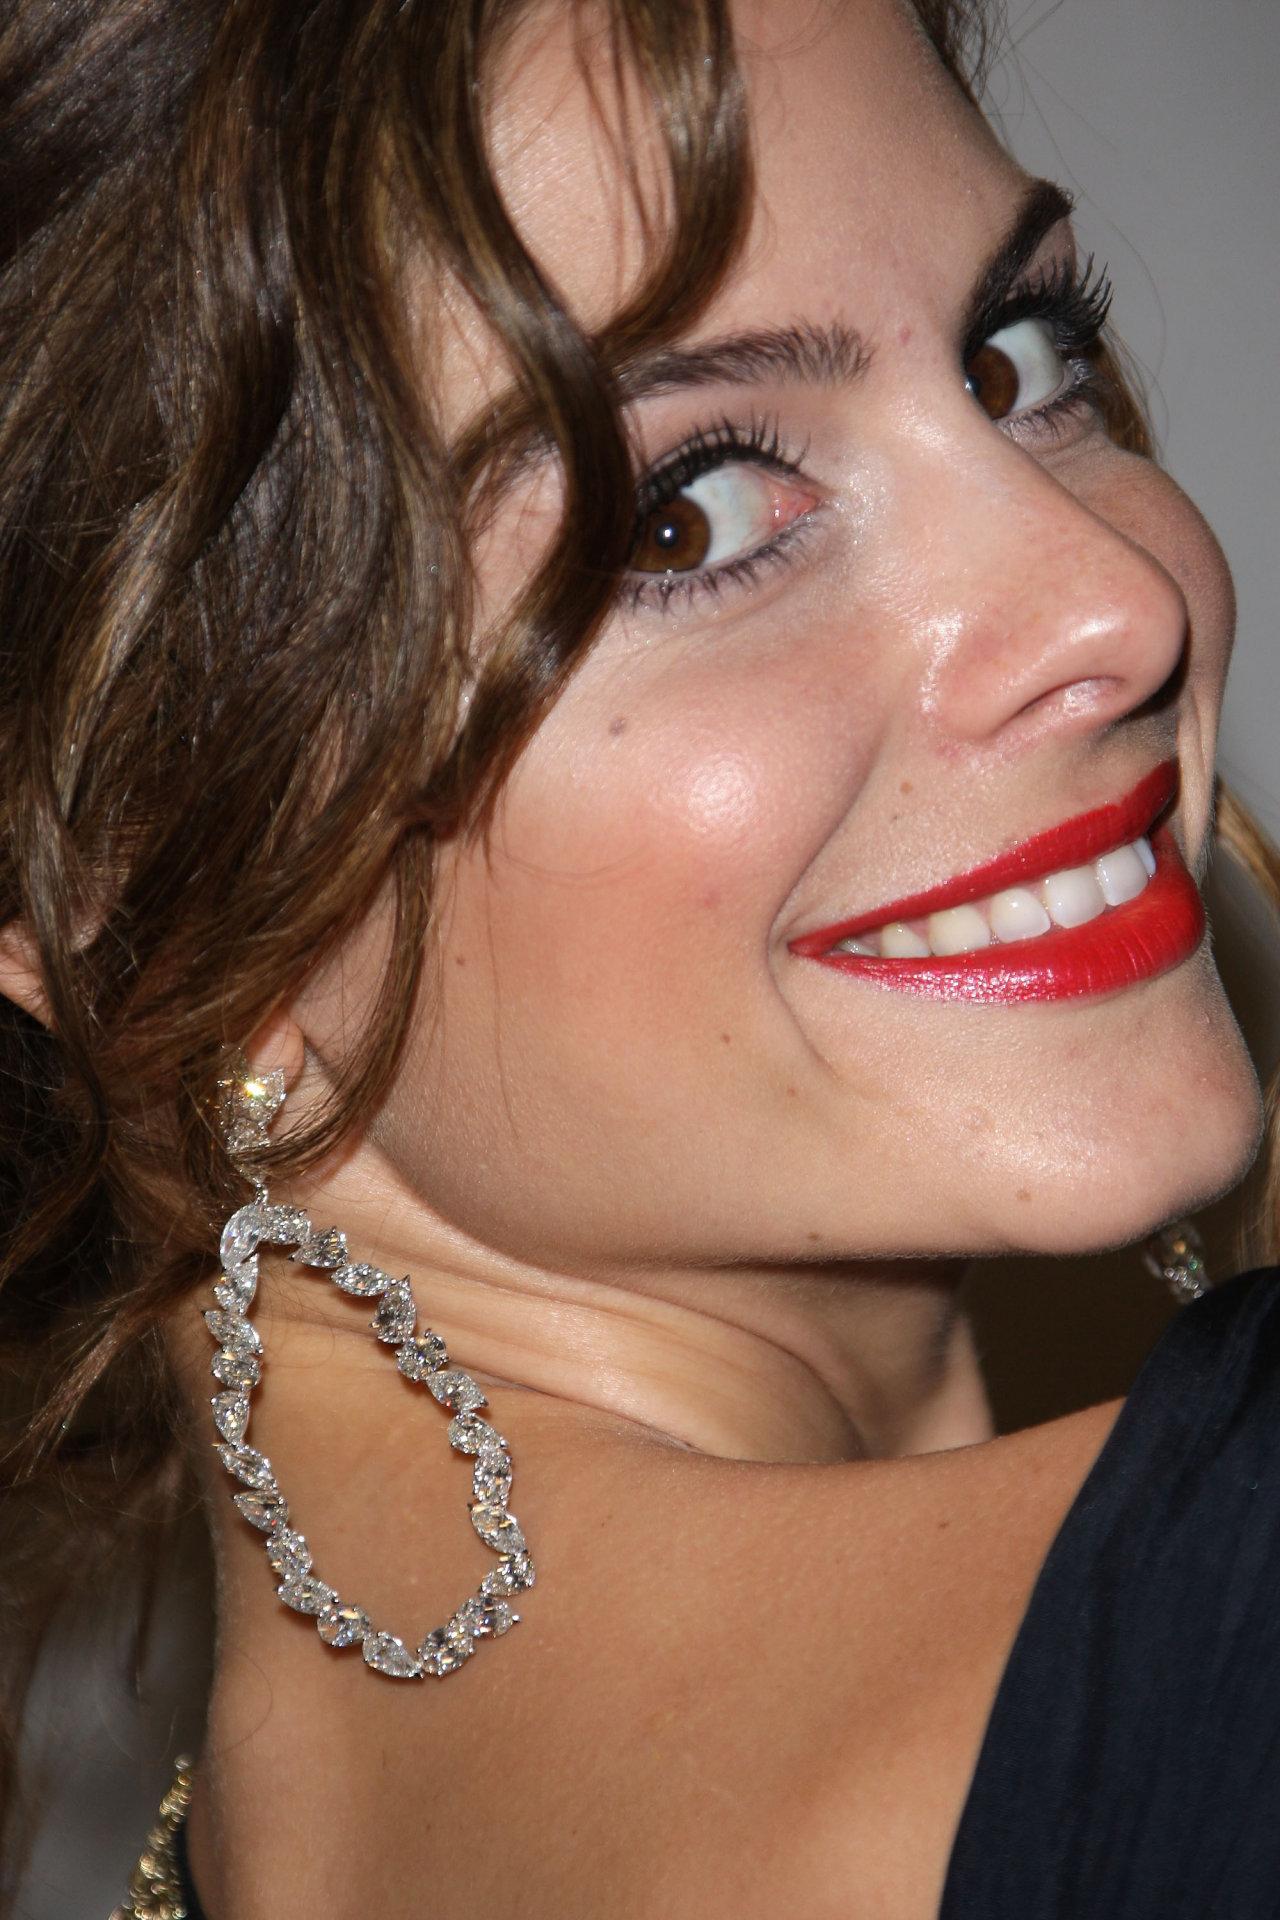 Мария Менунос (Мария Menounos)